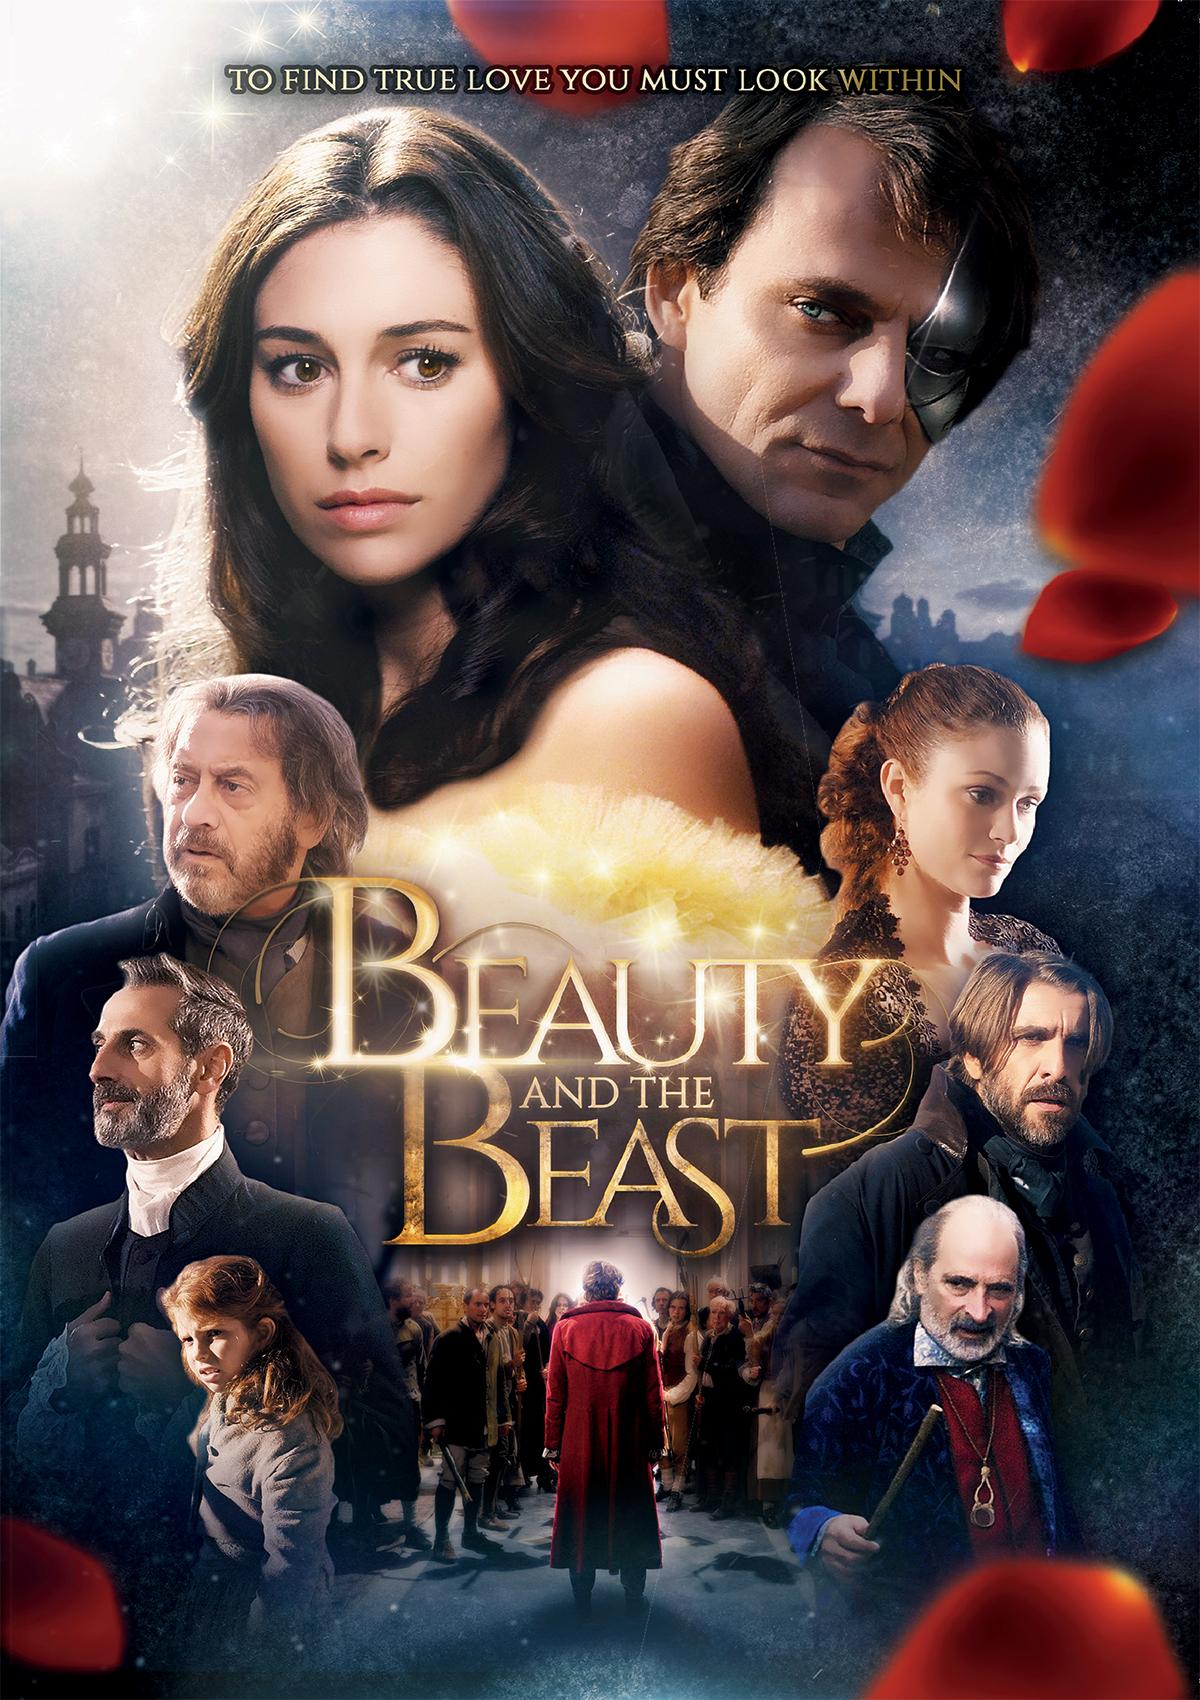 Léa Bosco, Alessandro Preziosi, Blanca Suárez, Alberto Basaluzzo, Jaime Olías, and Giusy Buscemi in Beauty and the Beast (2014)